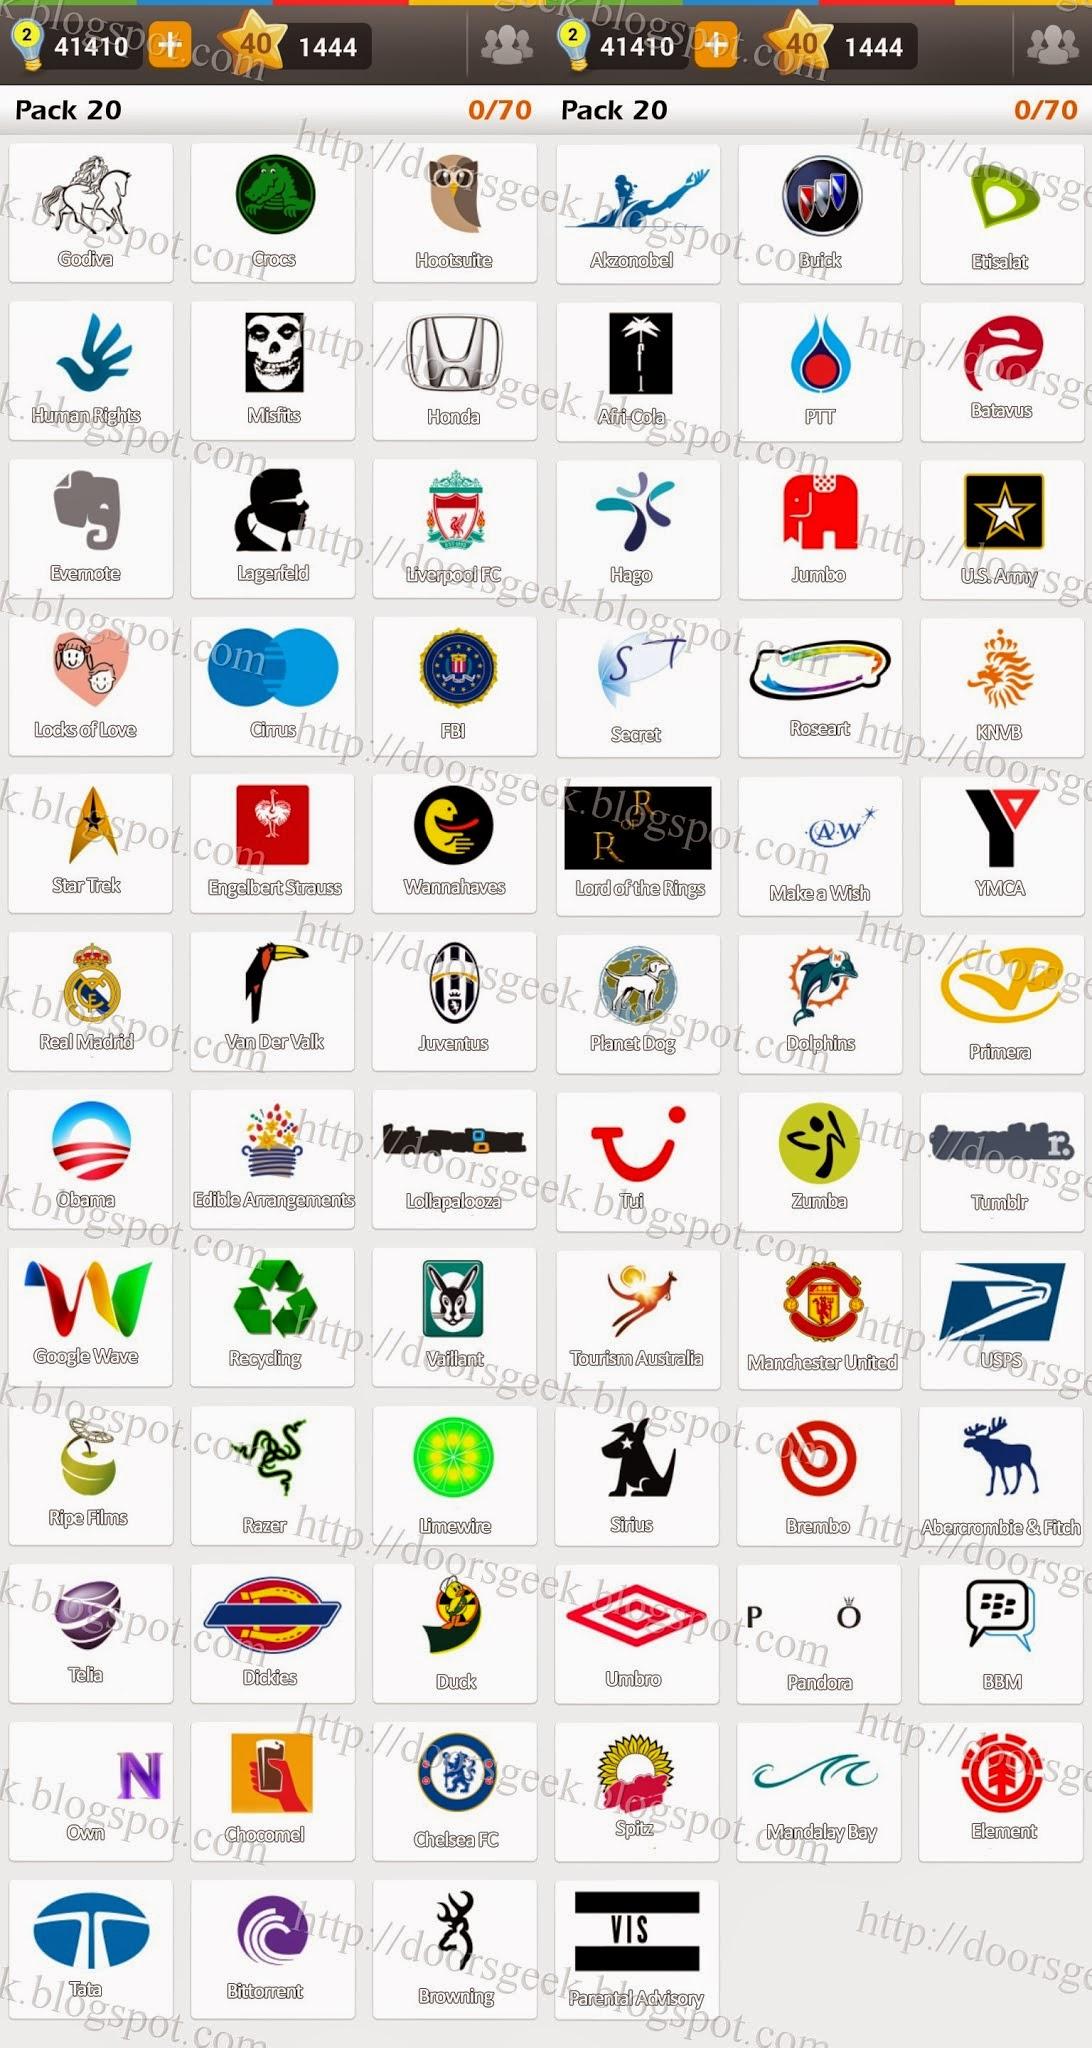 Logo game guess the brand bonus cars chainimage - Filename Logo Game Pack 20 Answers Jpg